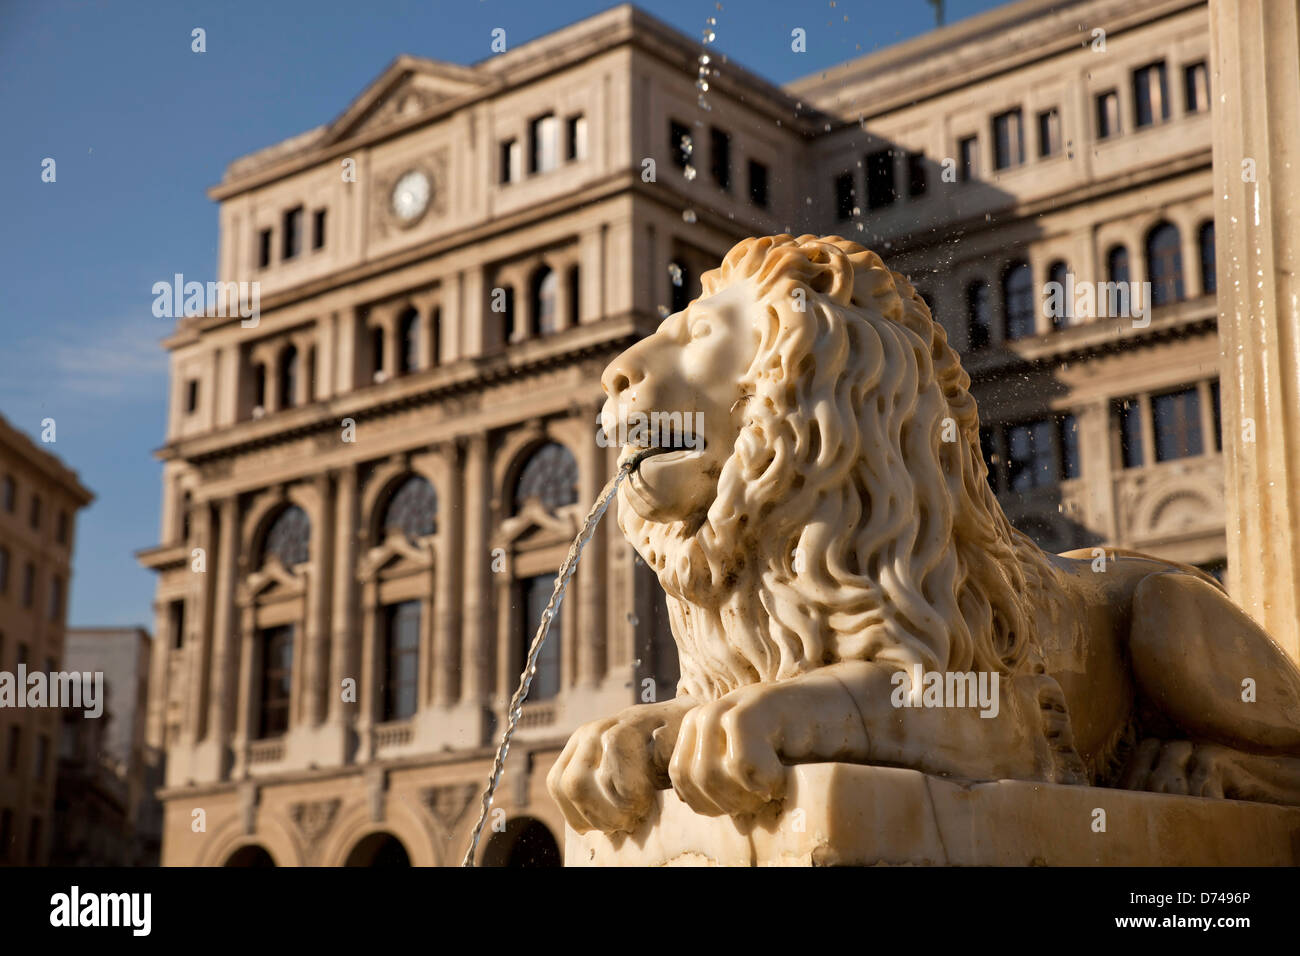 Lonja del Comercio in Havanna, Kuba, Karibik | marble lion of the fountain Fuente de los Leones and Havana Stock Stock Photo